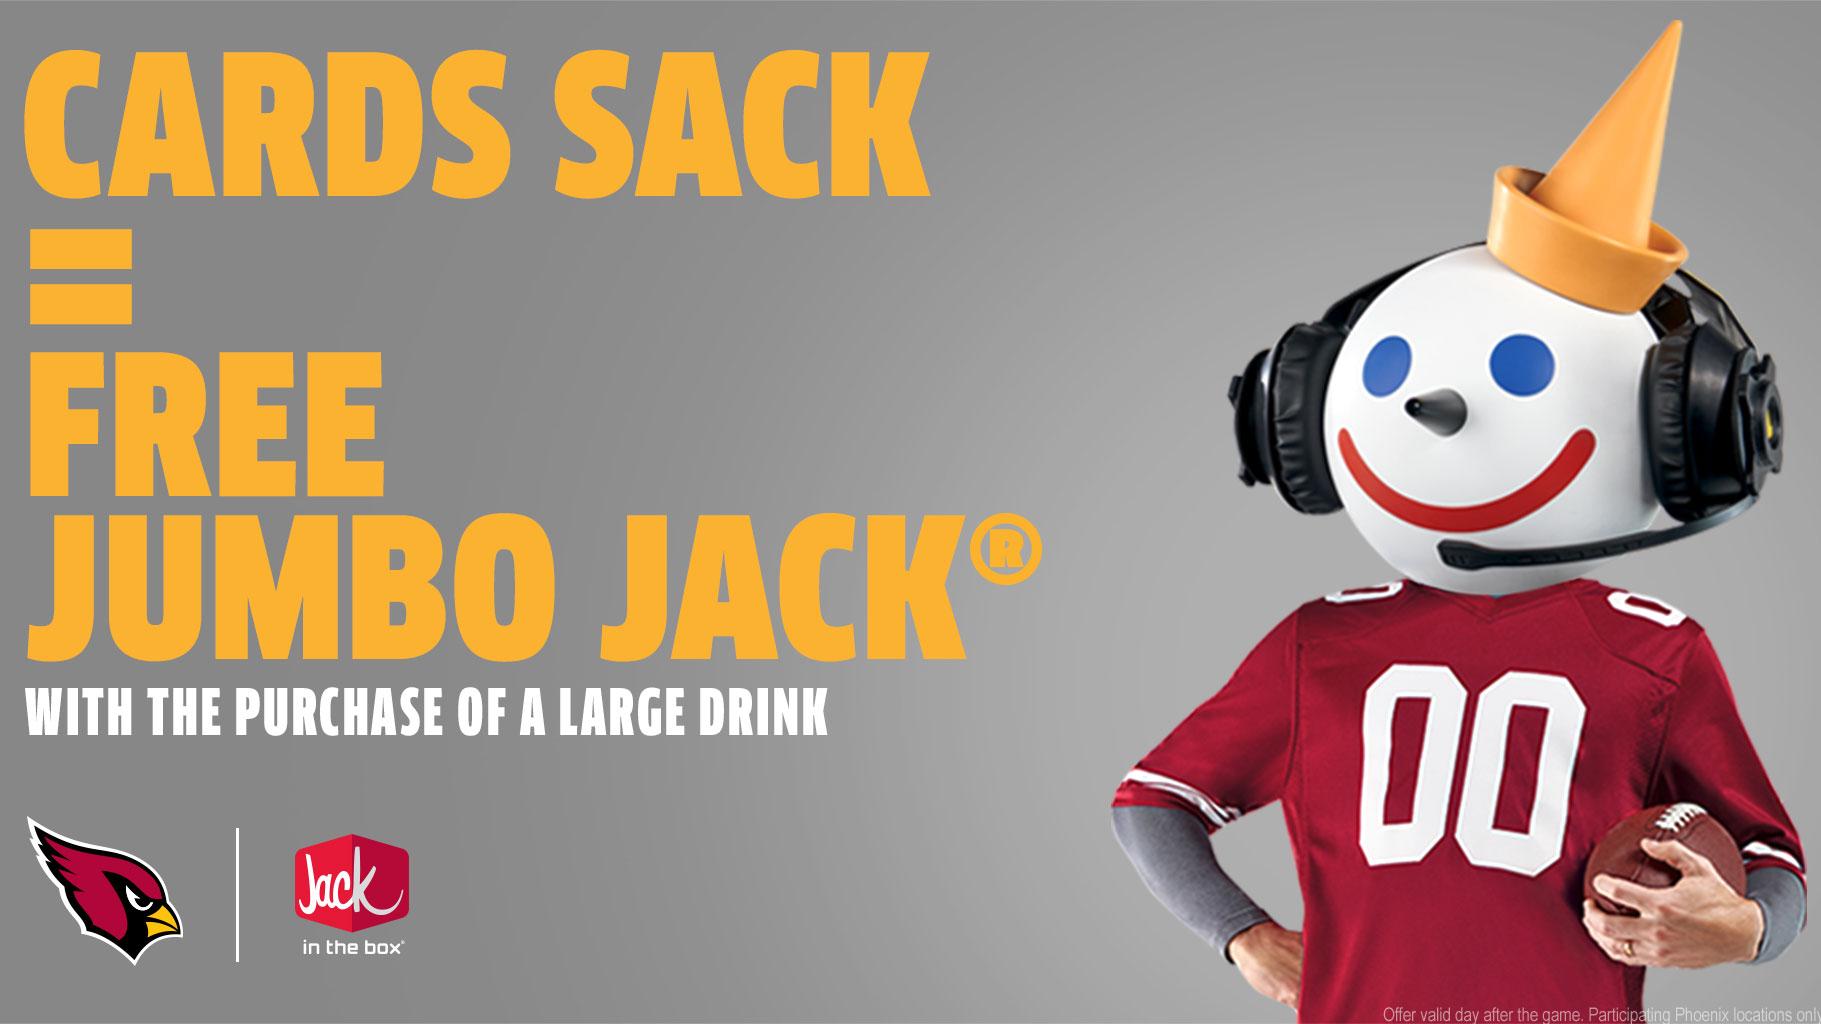 Jack In The Box Jumbo Jack